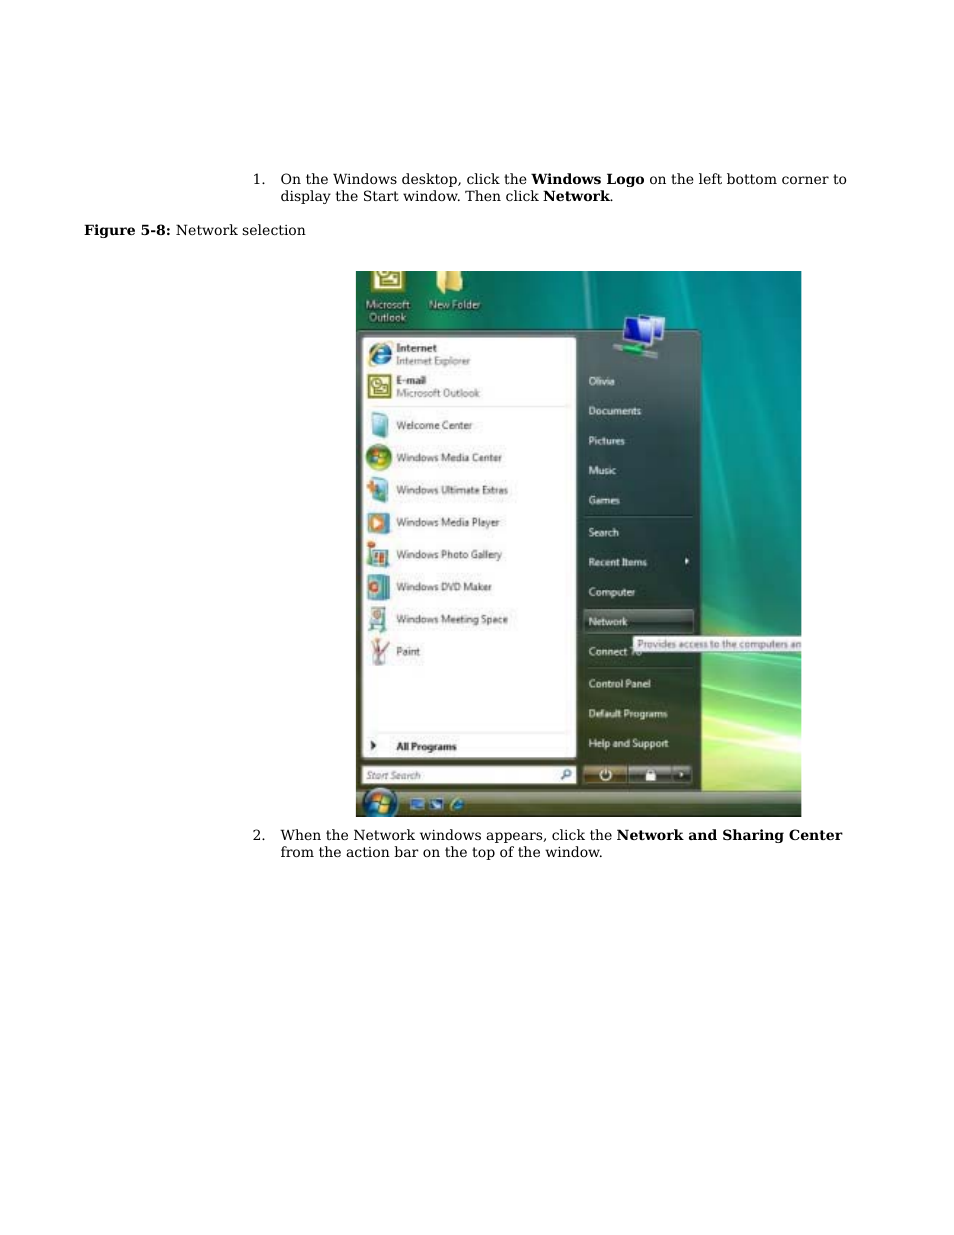 configuring tcp ip in windows vista motorola cpei 885 user manual rh manualsdir com Bissell PowerSteamer User Manual windows vista user manual pdf